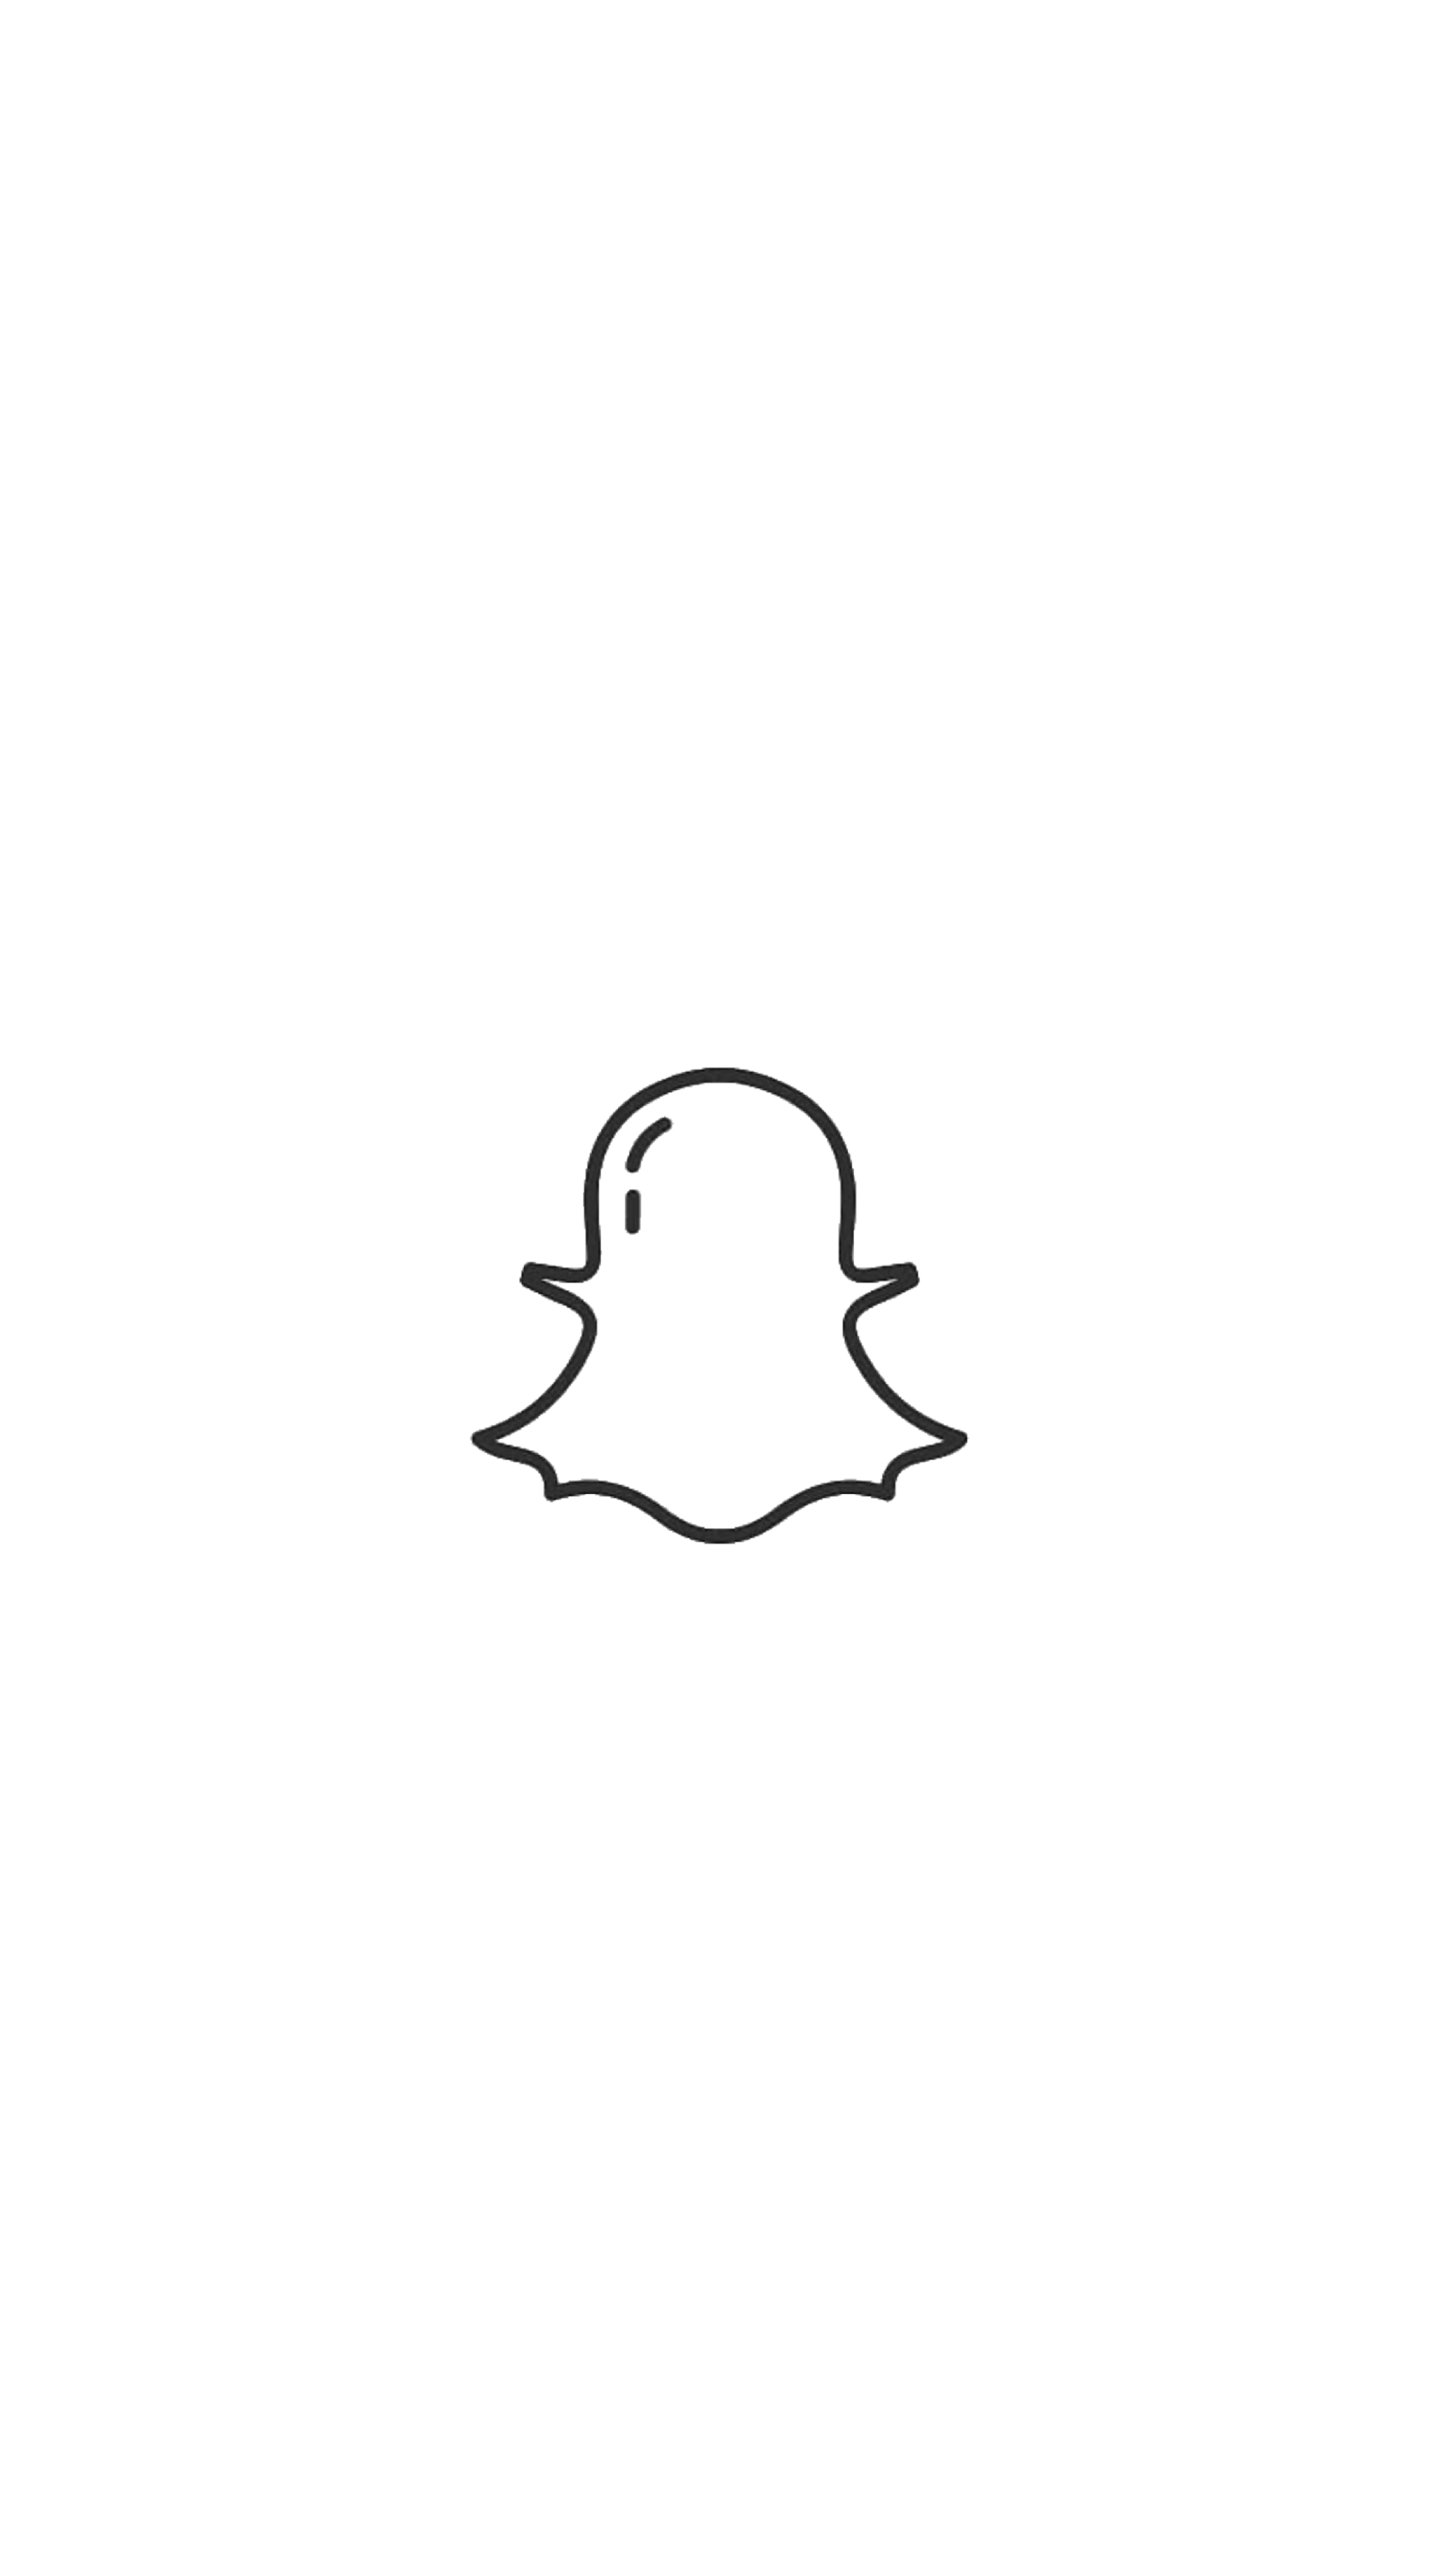 Snapchat White Png : snapchat, white, Snapchat, Icon,, Iphone, Photo, Wallpaper, Tumblr, Aesthetic